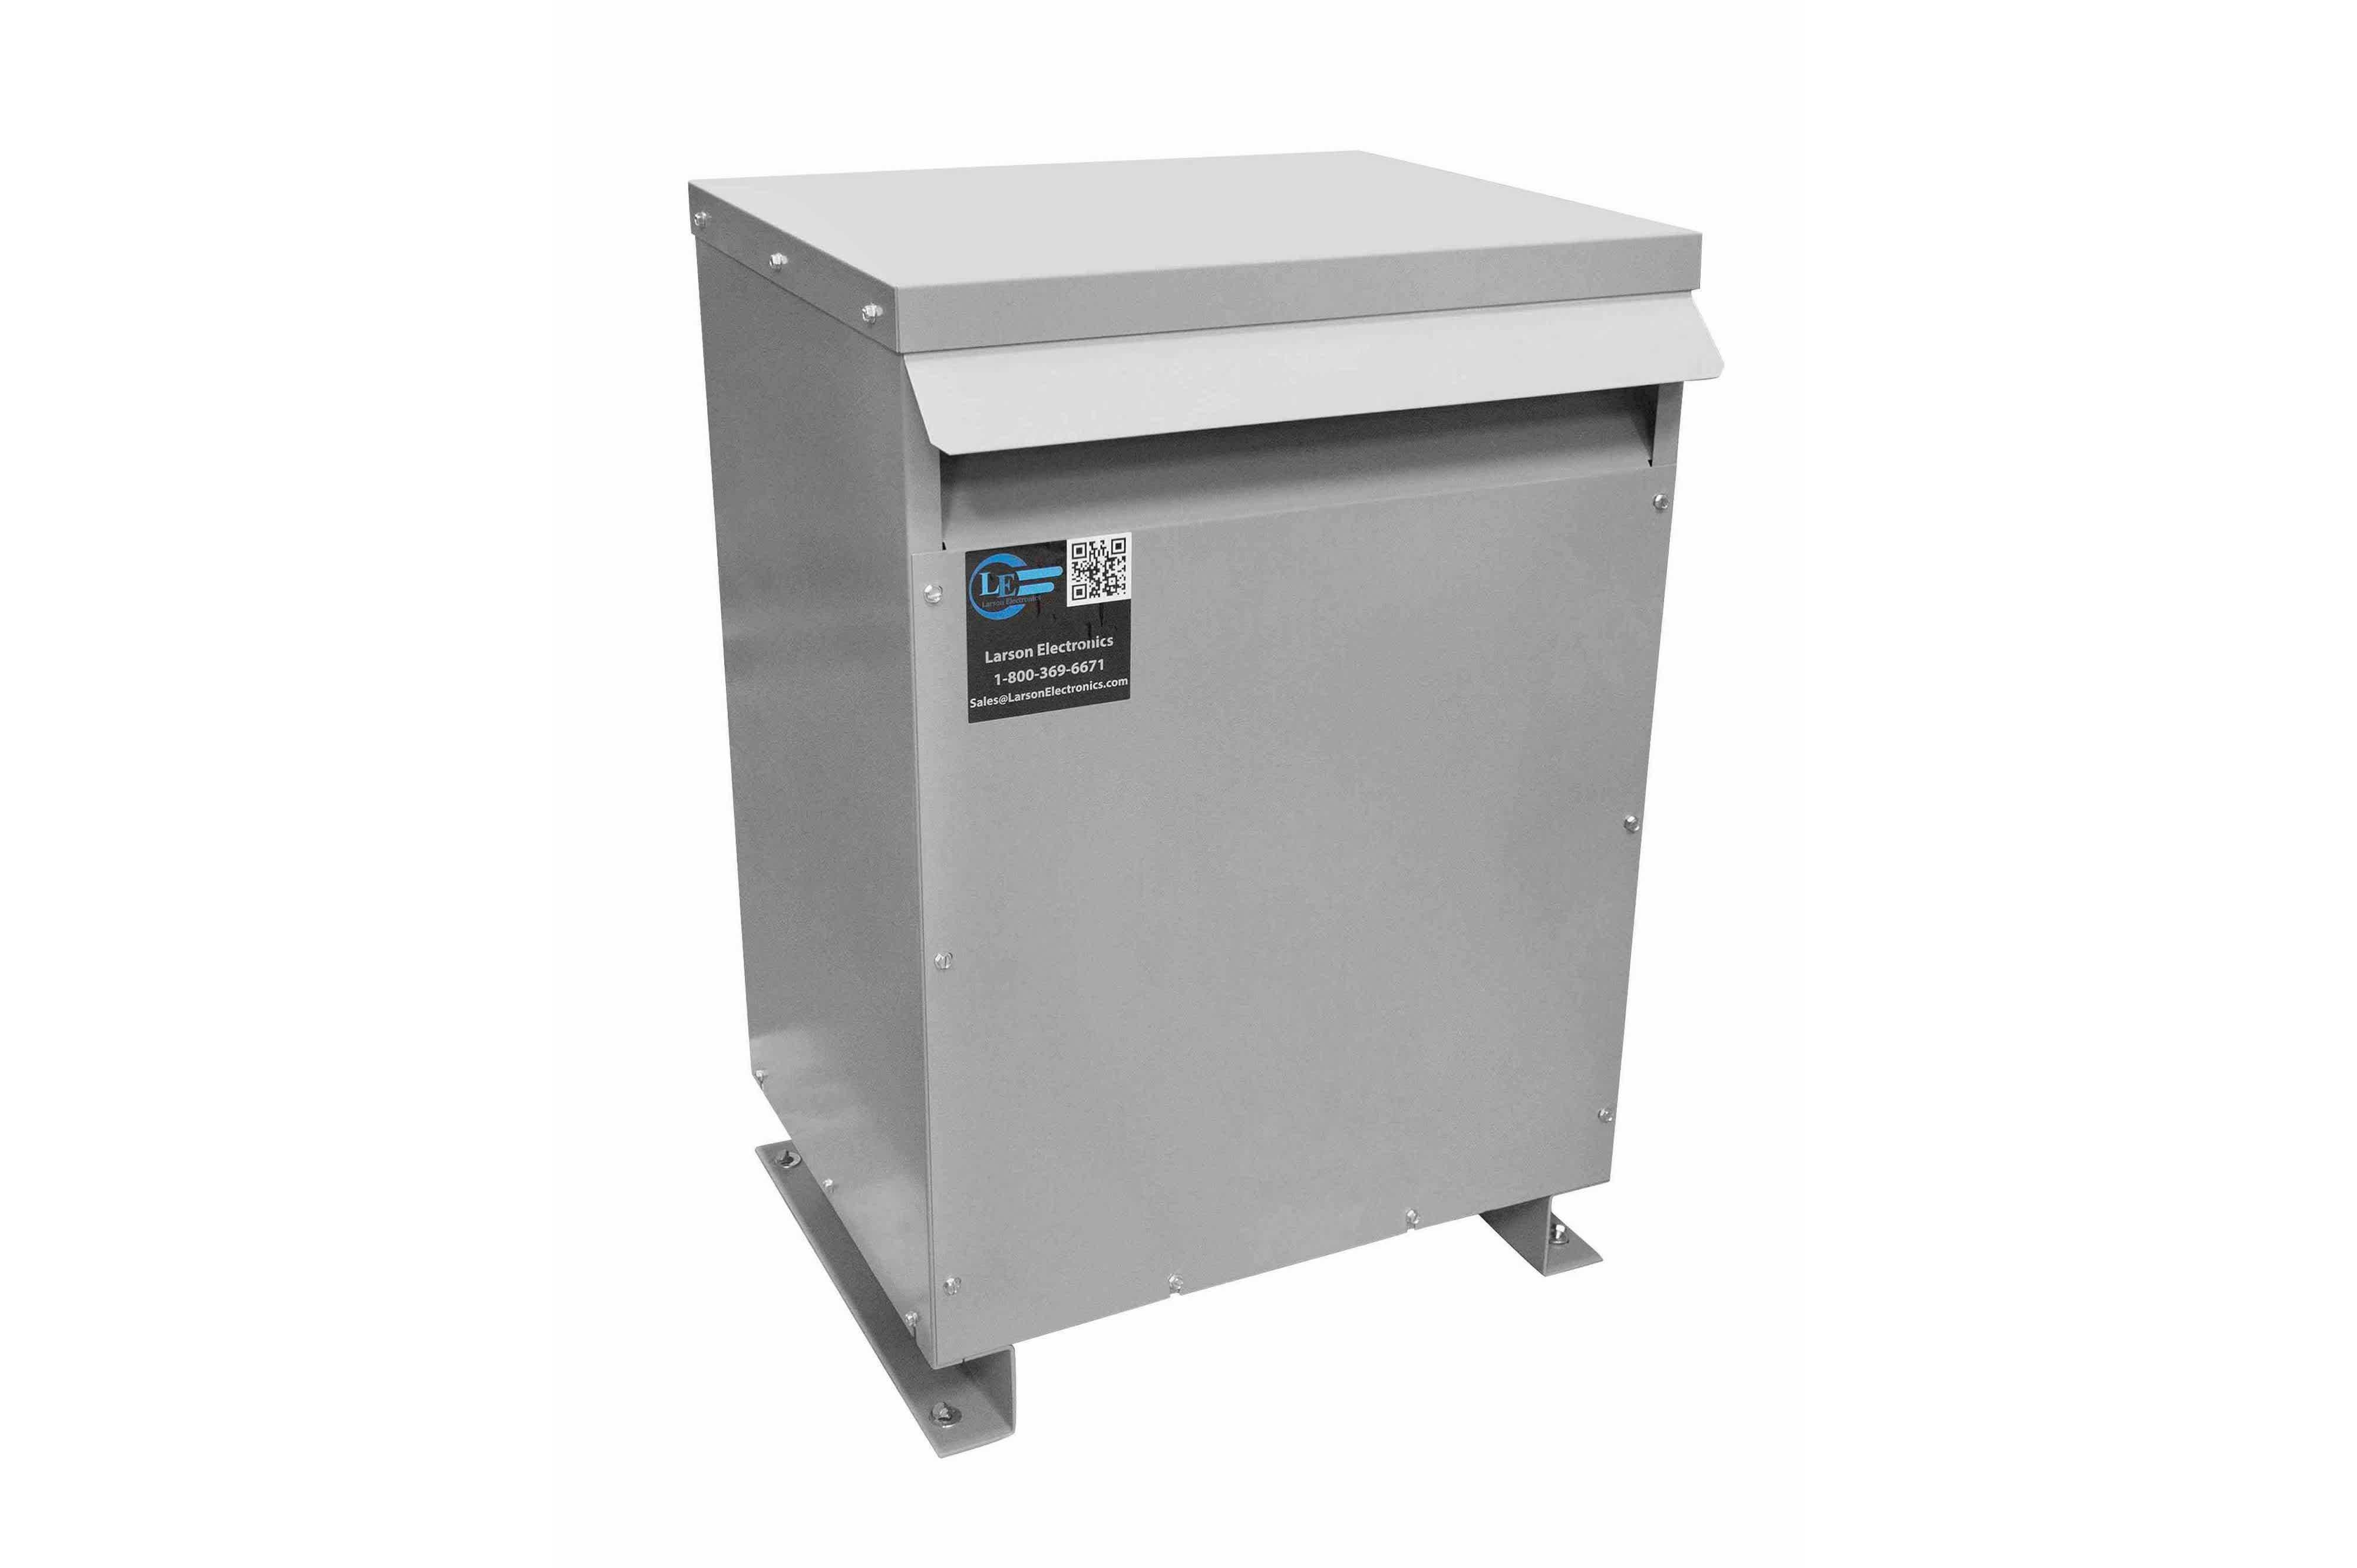 55 kVA 3PH Isolation Transformer, 220V Wye Primary, 480Y/277 Wye-N Secondary, N3R, Ventilated, 60 Hz